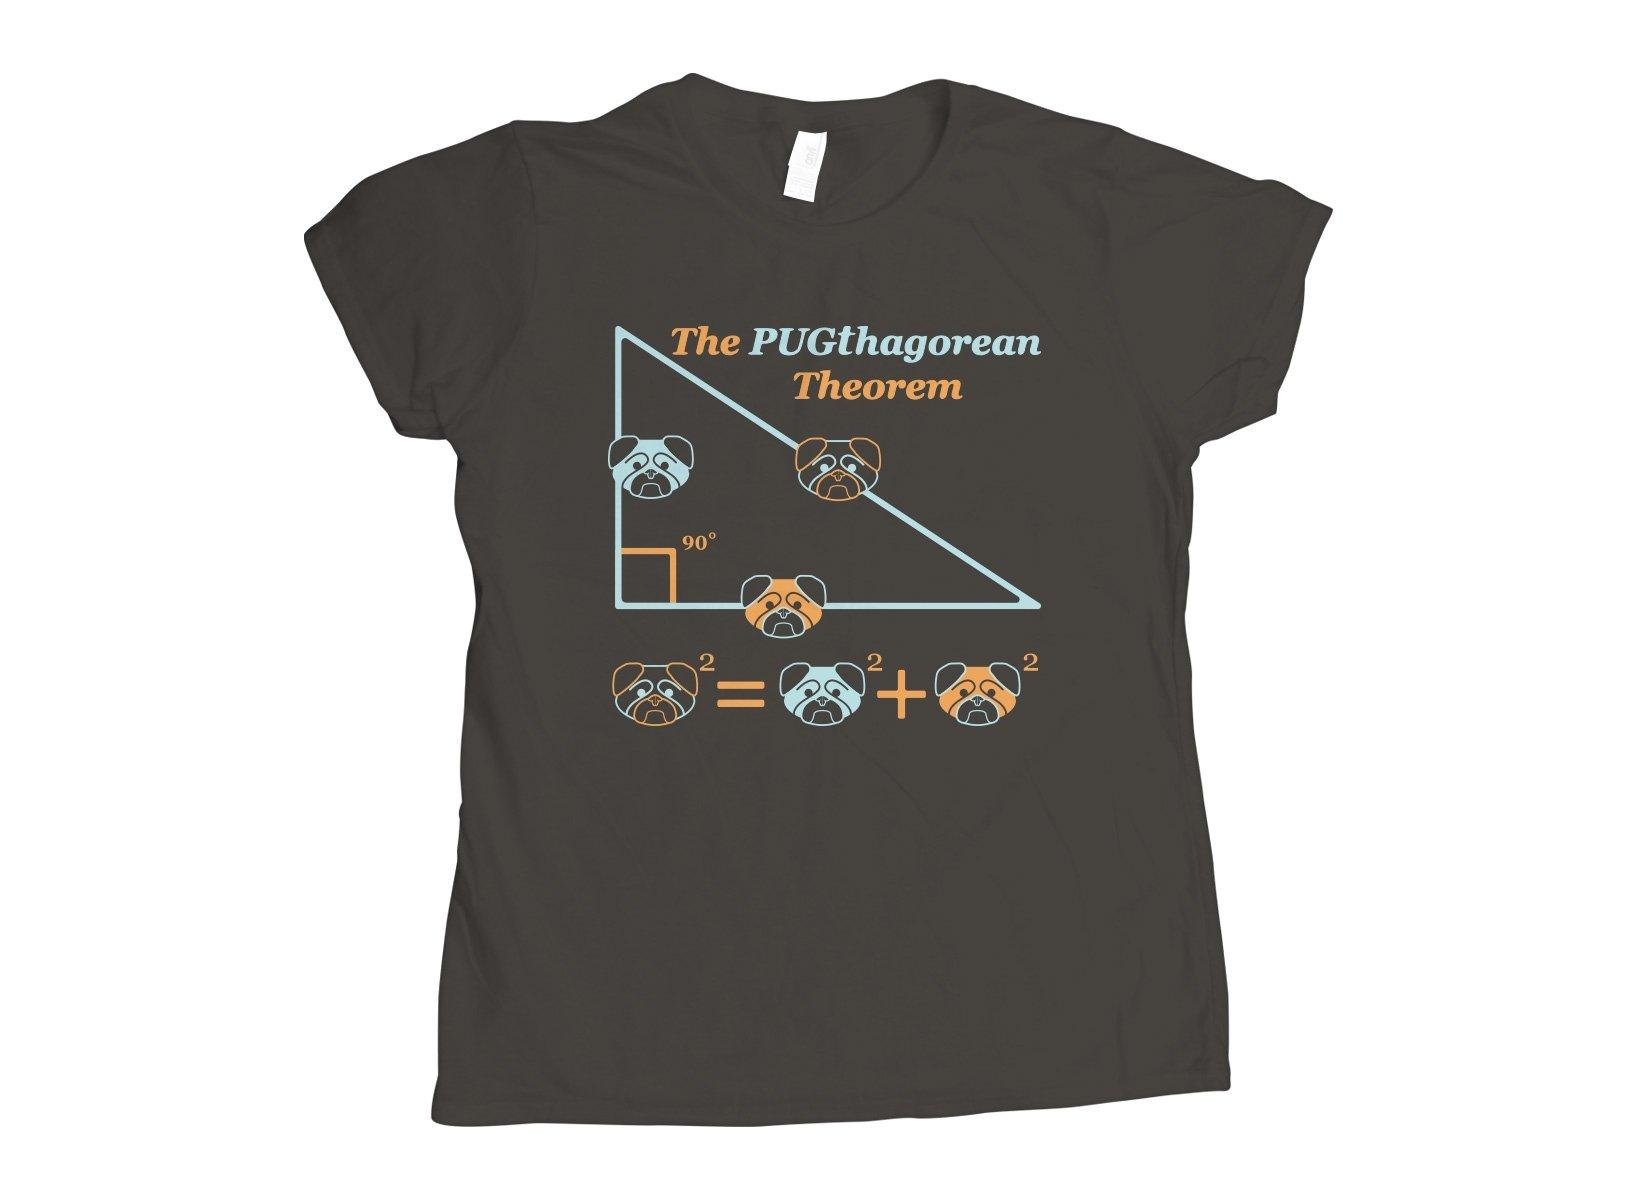 Pugthagorean Theorem on Womens T-Shirt